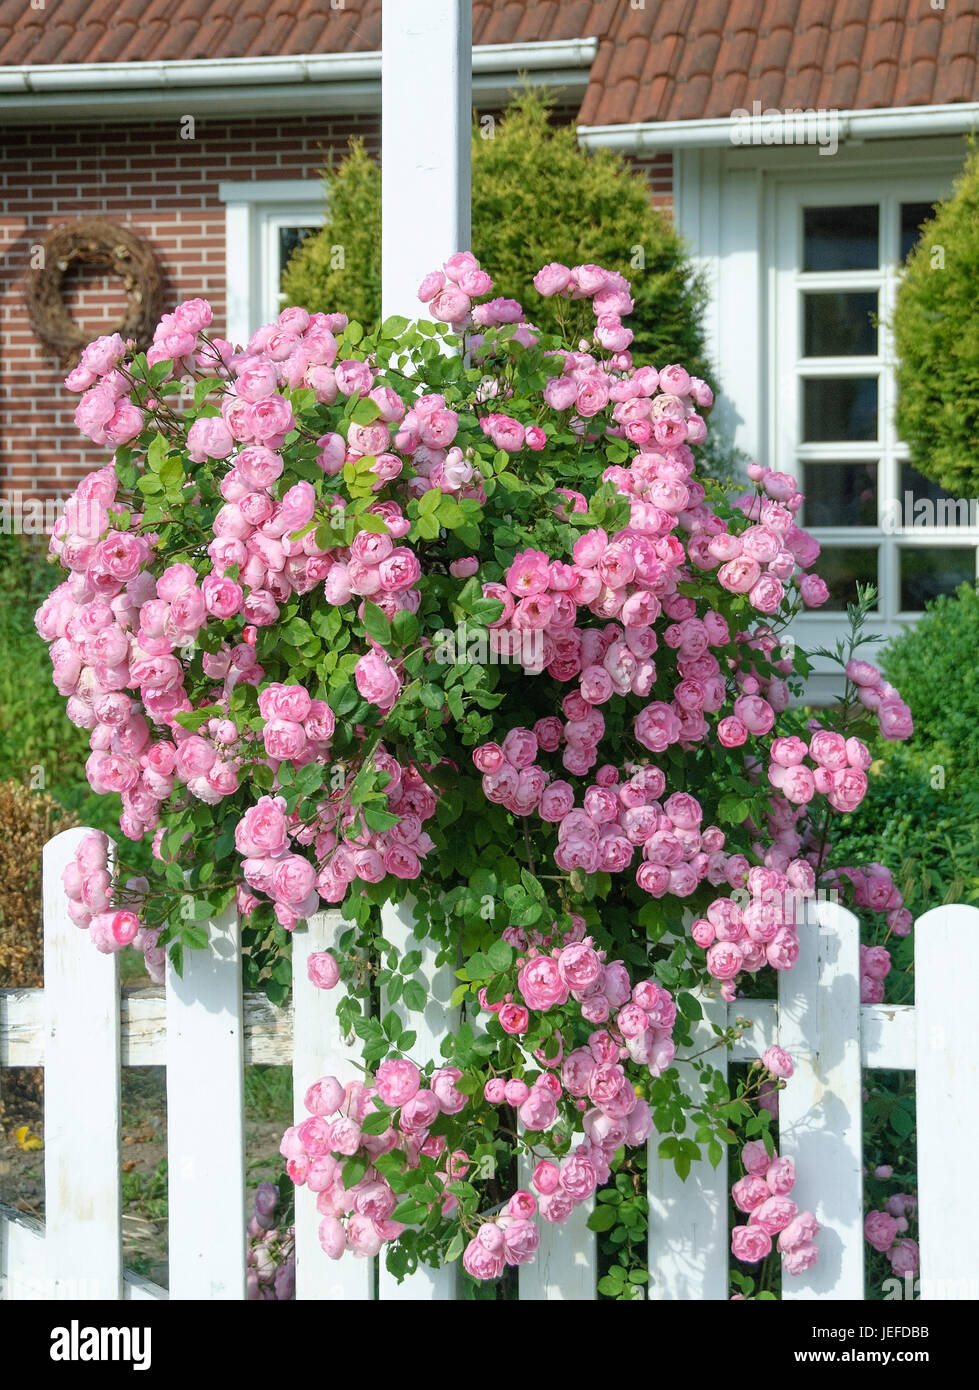 rambler rose rose raubritter rambler rose rosa. Black Bedroom Furniture Sets. Home Design Ideas